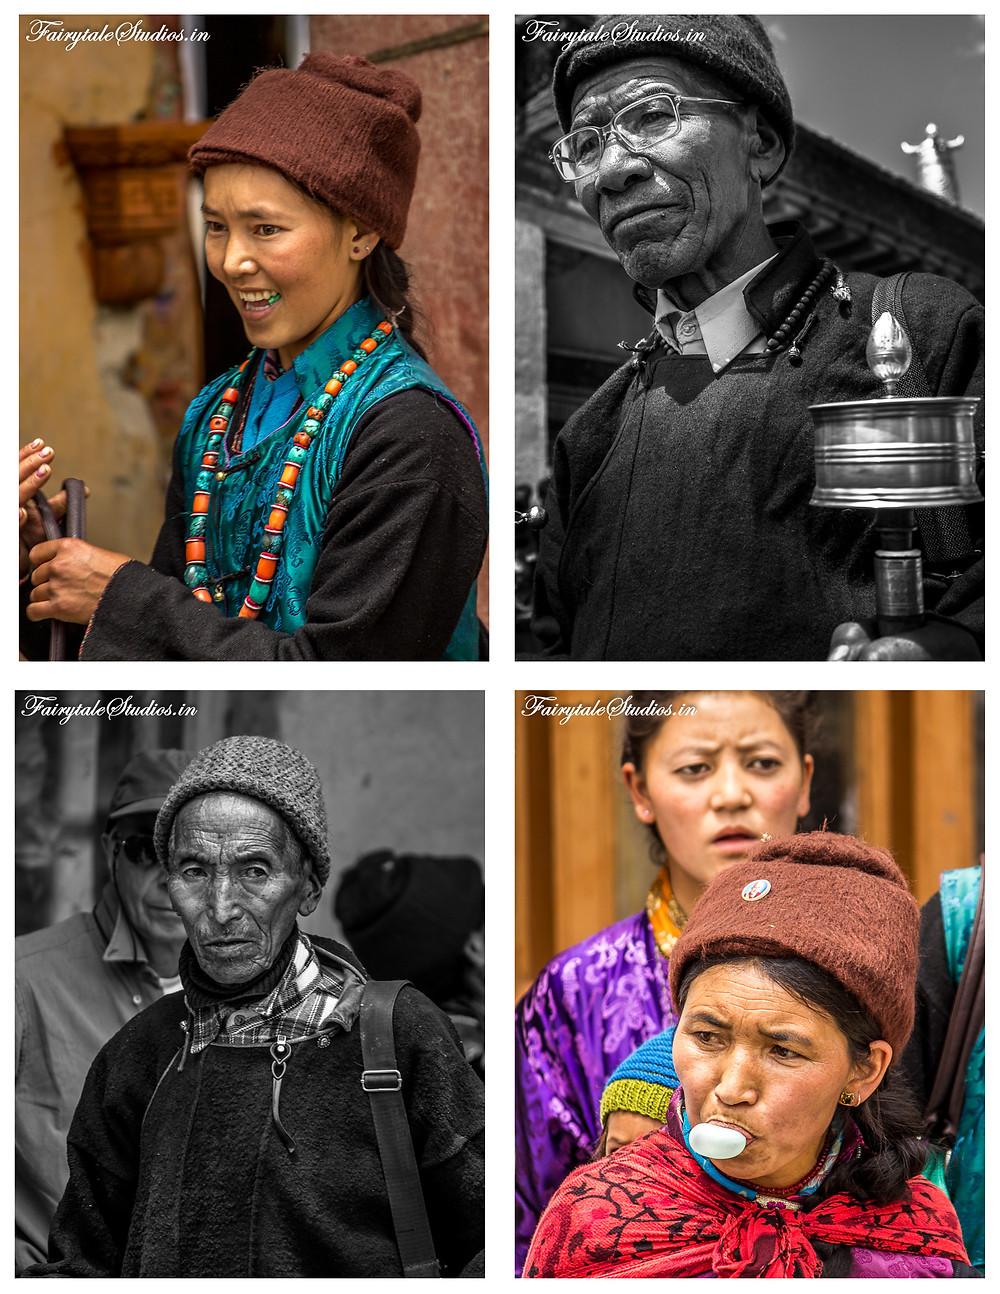 People enjoying and eagerly waiting for the Stongdey festival to start (The Zanskar Odyssey Travelogue)